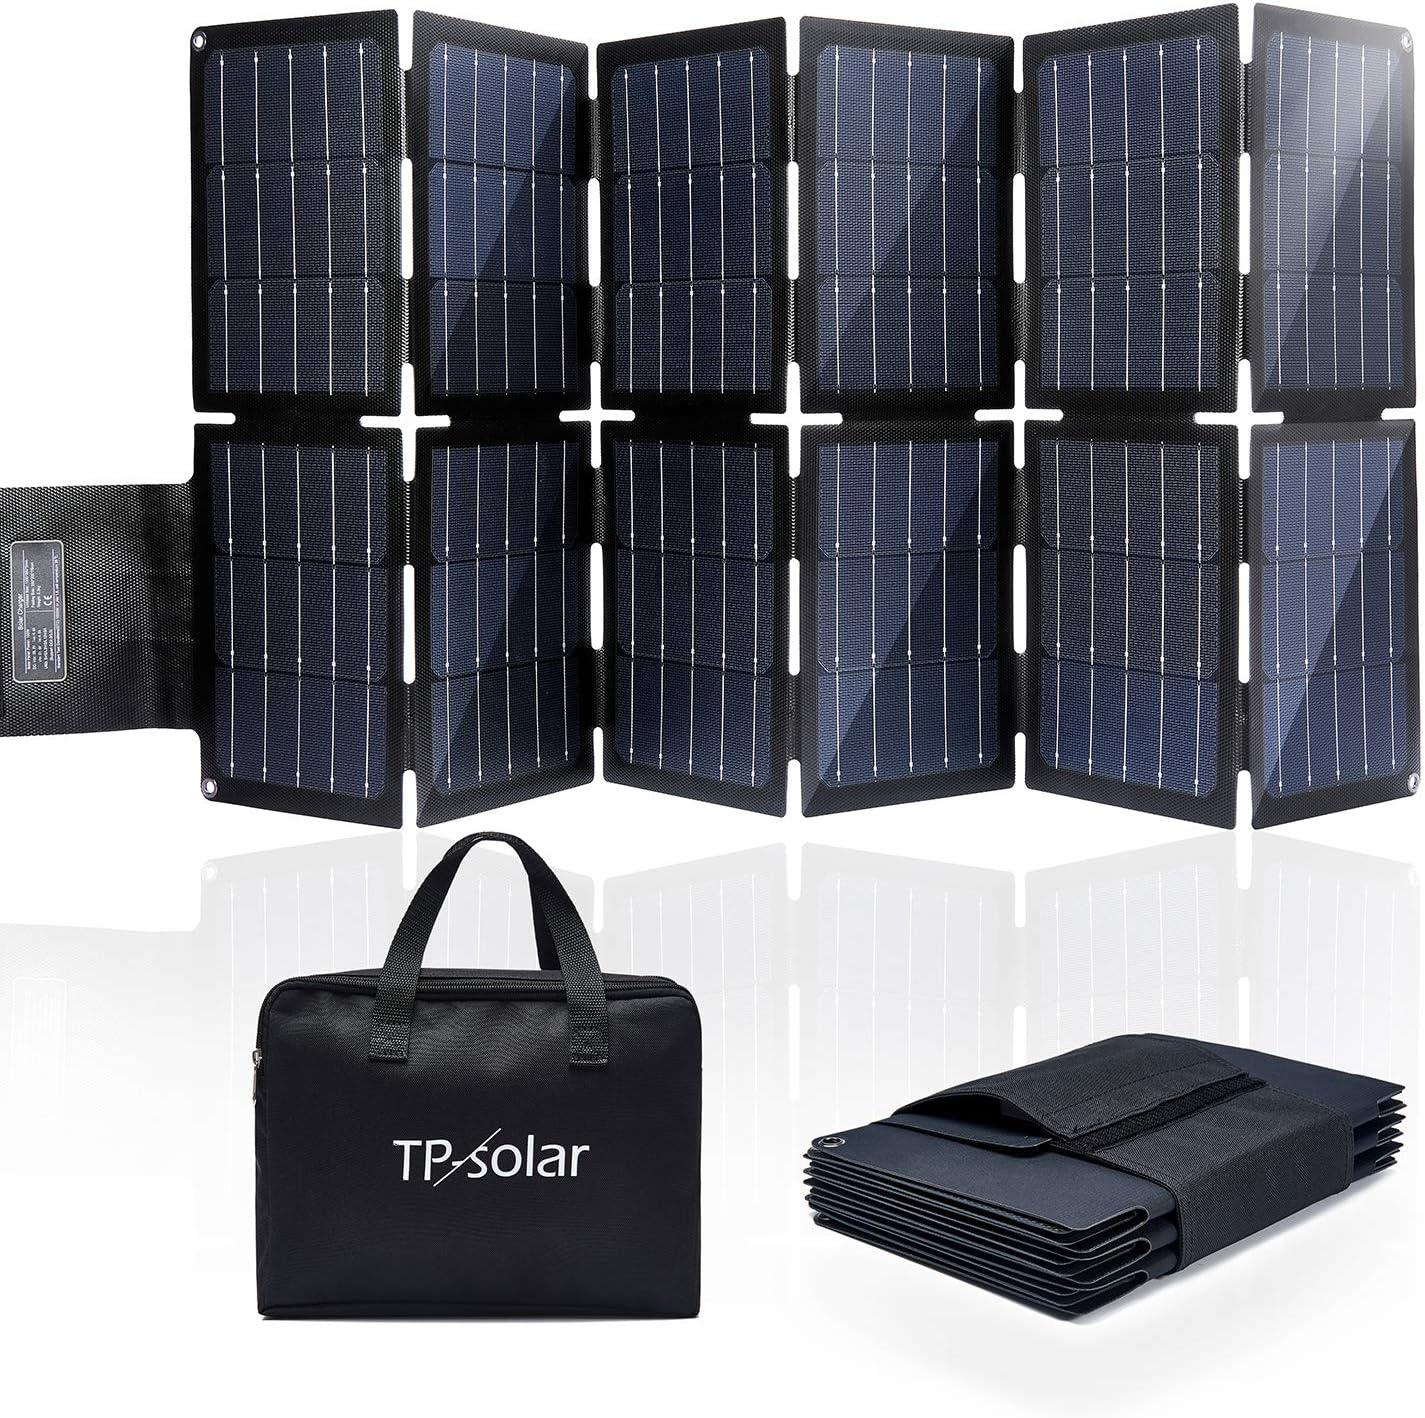 TP-SOLAR Portable Power Station